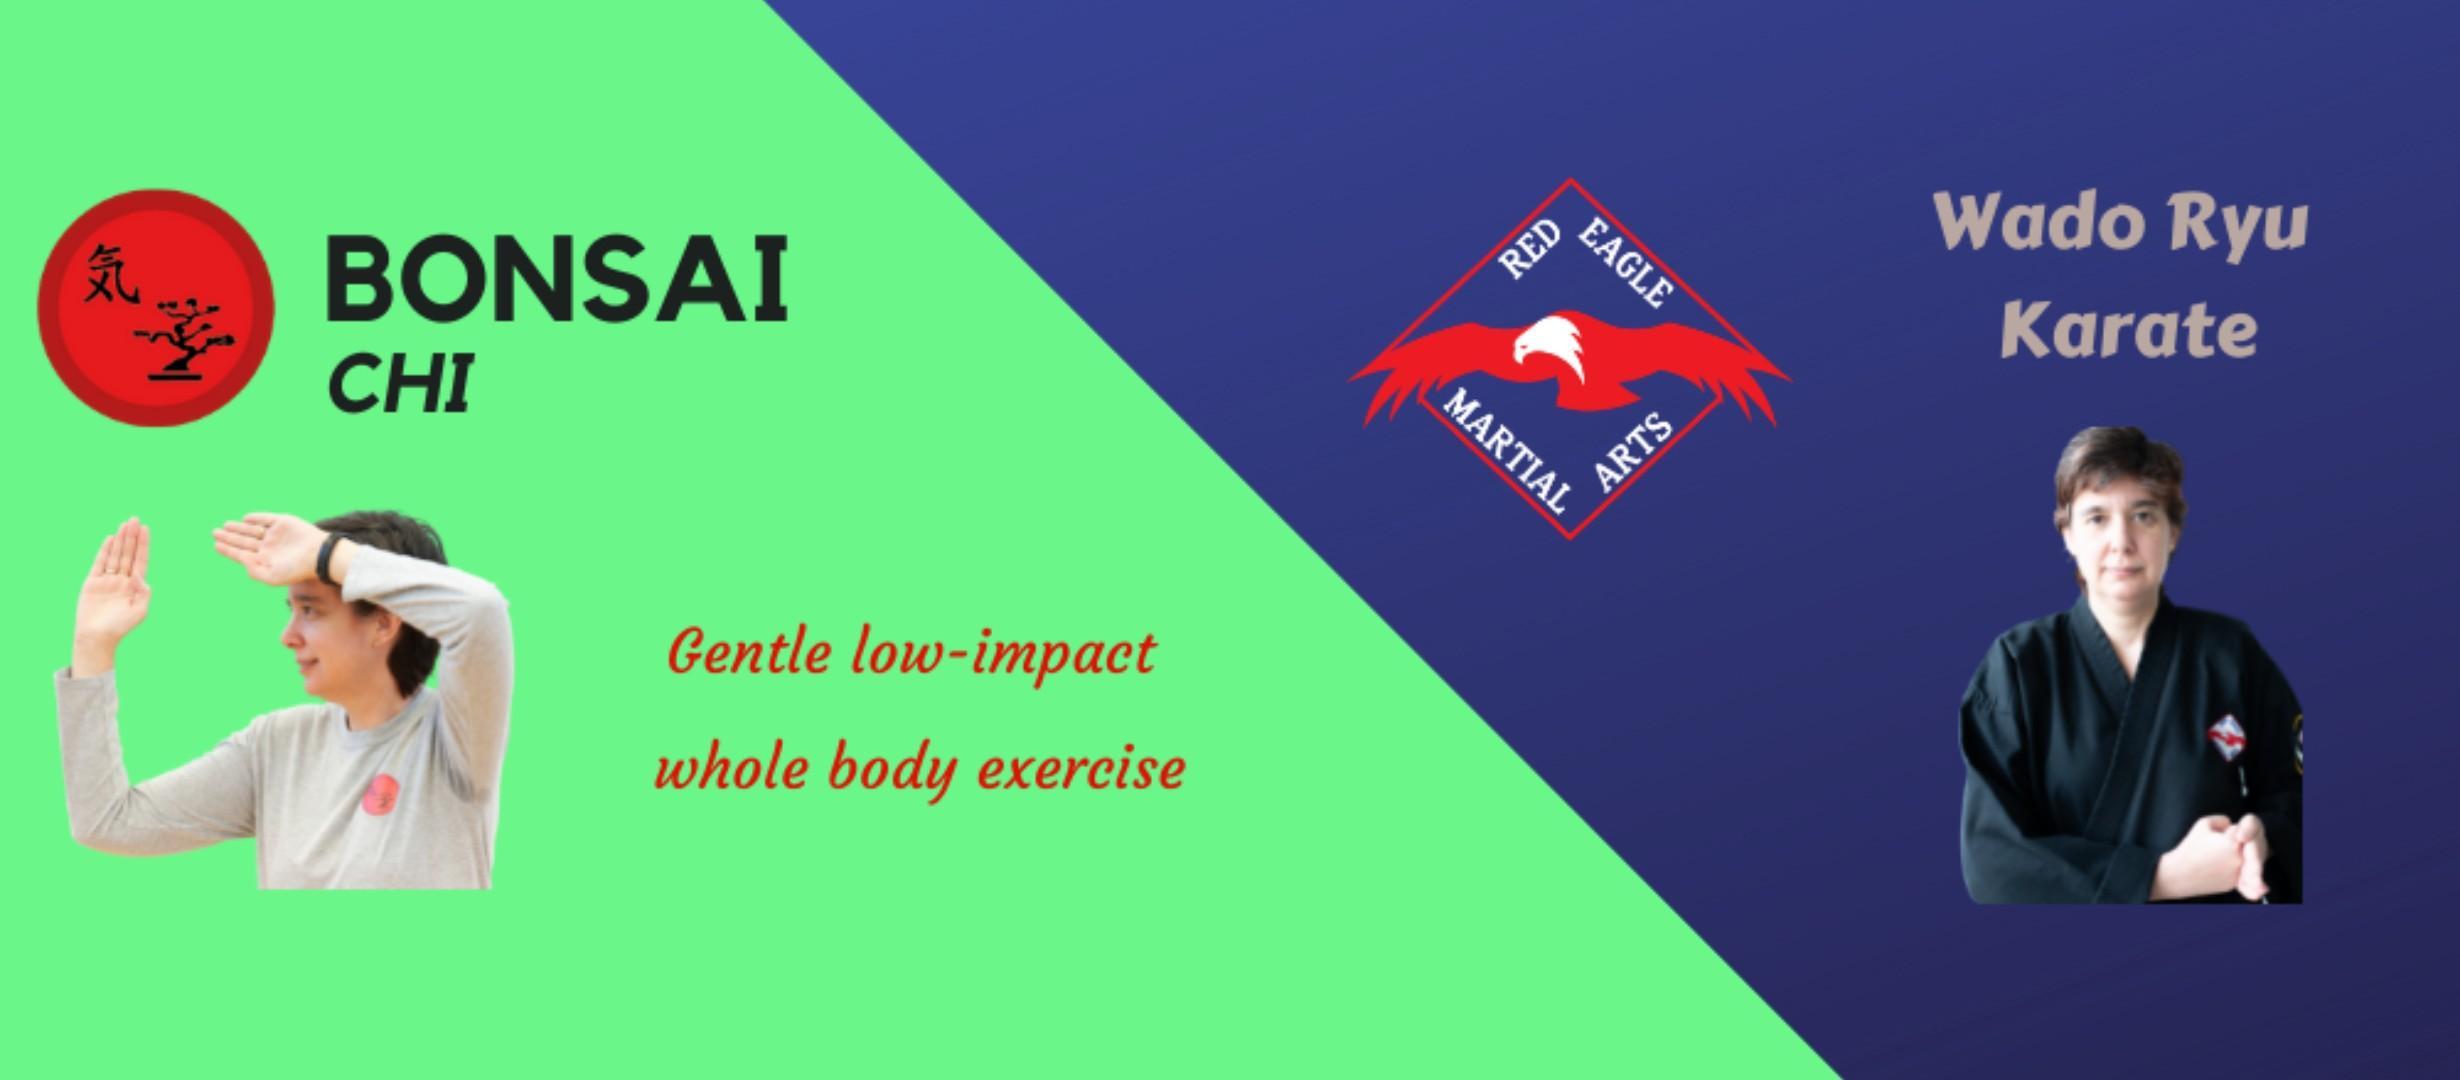 Traditional Wado Ryu karate & Bonsai Chi, gentle low-impact exercise